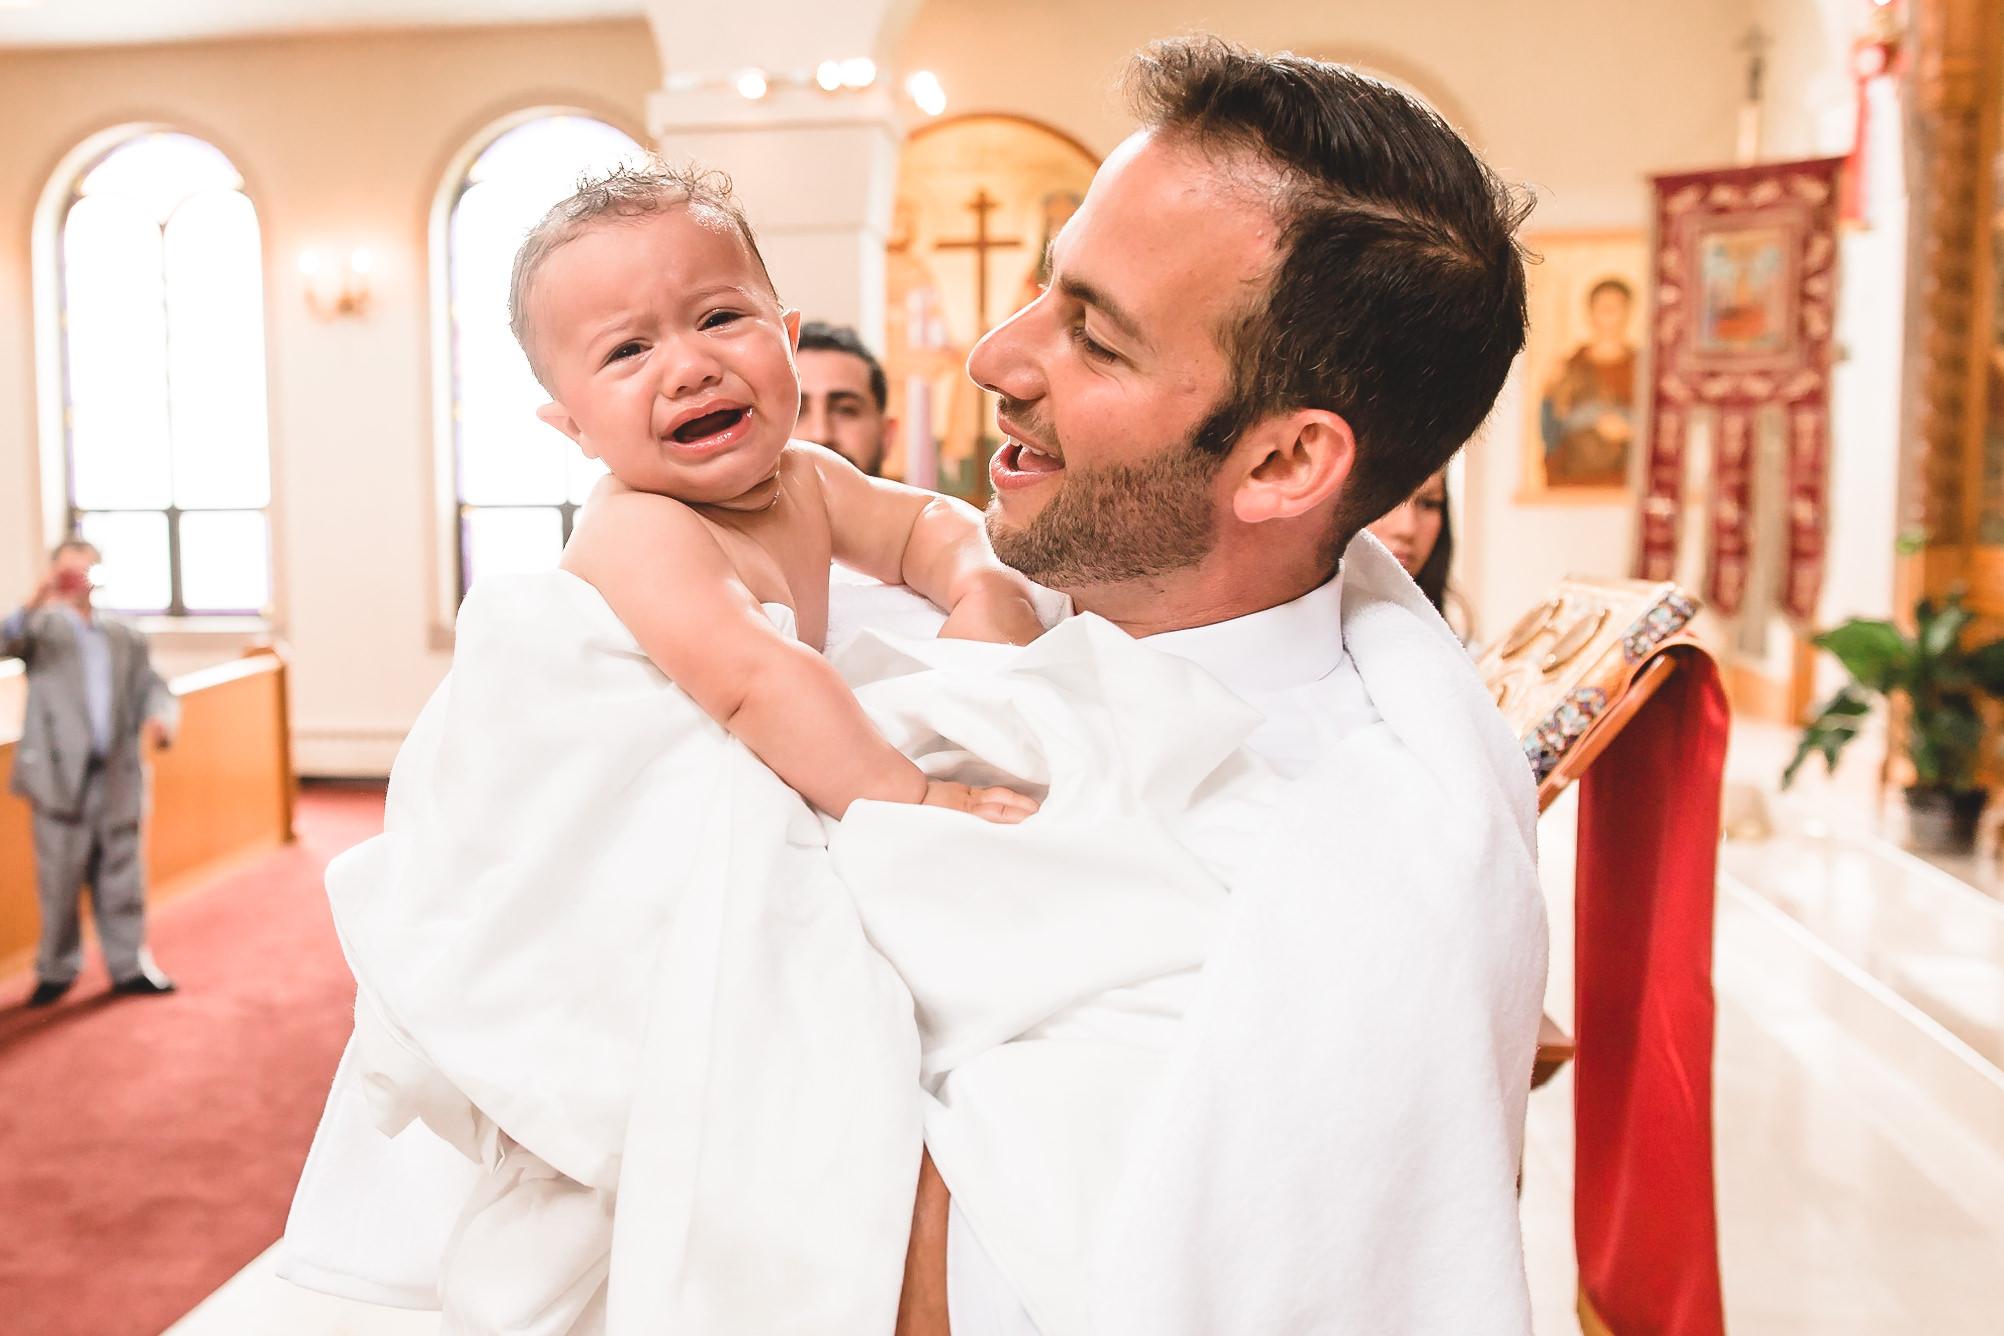 Kimisis Tis Theotokou baptism holmdel nj daniel nydick (21 of 36).jpg